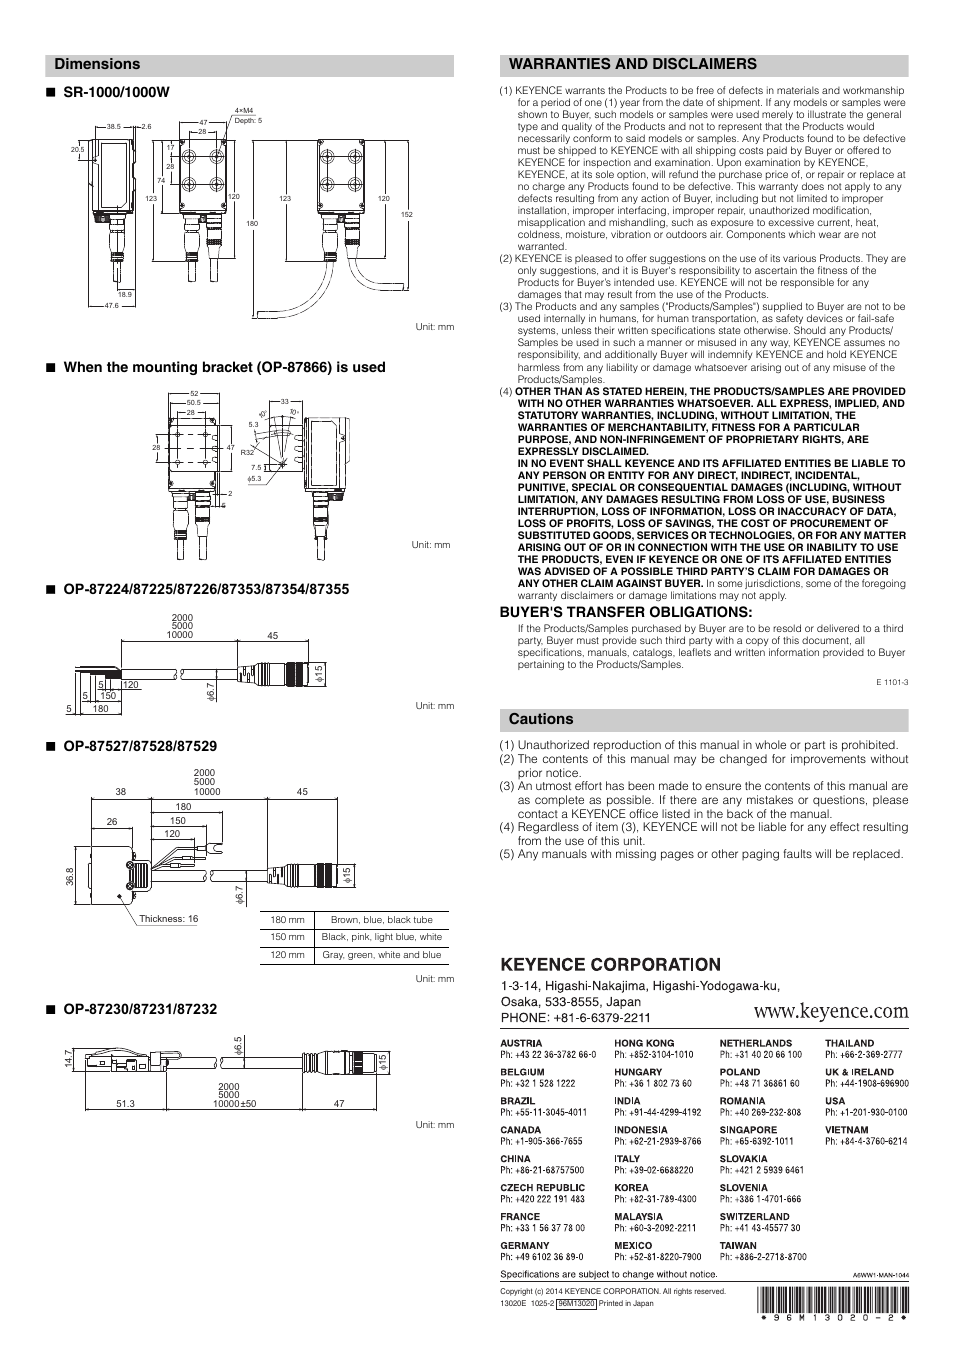 keyence sr 1000 series page6 100 [ 2002 honda 300ex manual ] 2003 honda 400ex wiring diagram KEYENCE SR1000 Mounting at mifinder.co